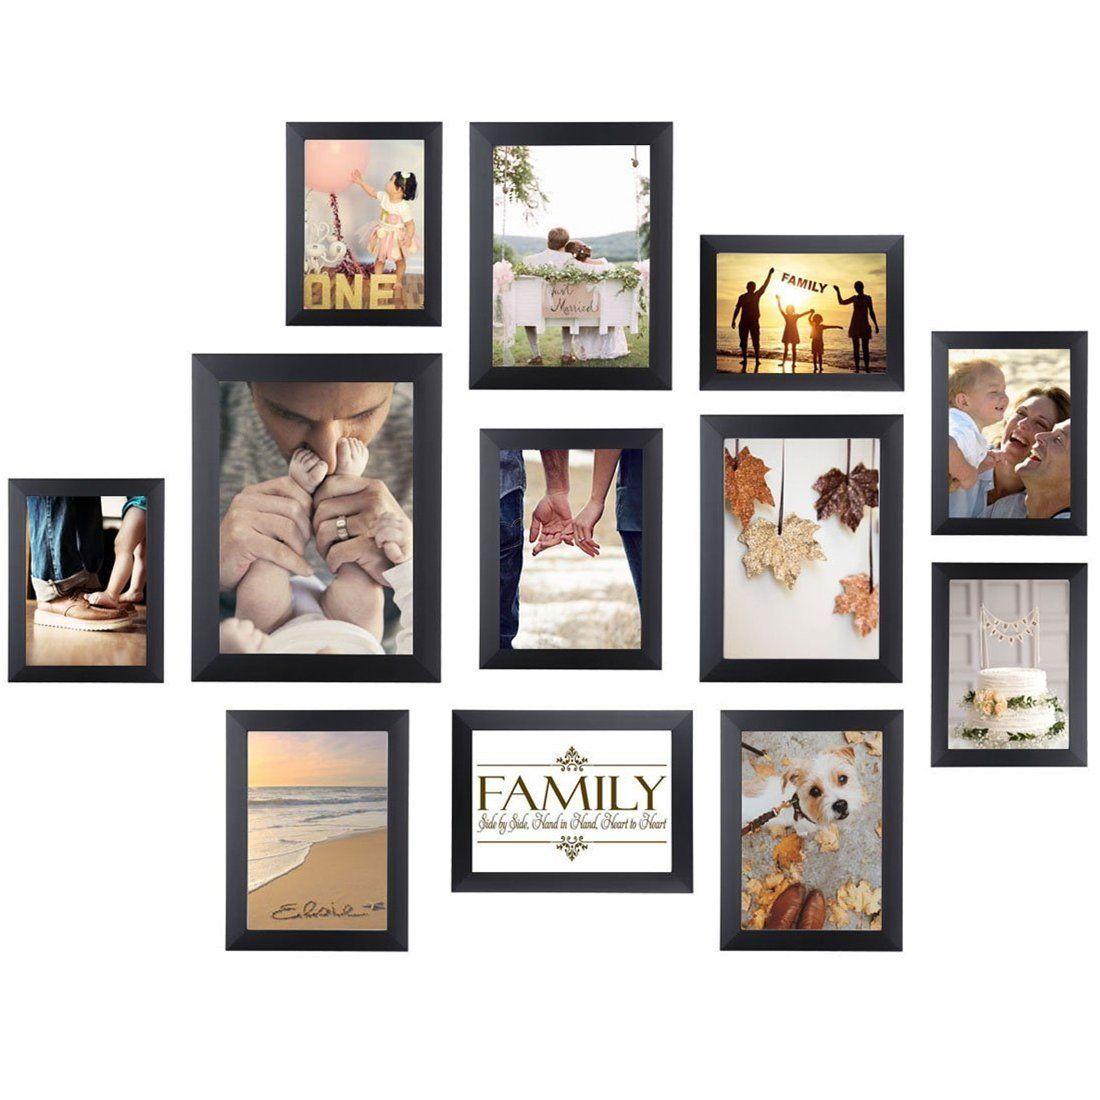 12 Marcos para collage de fotos | Pinterest | Marcos para collage de ...